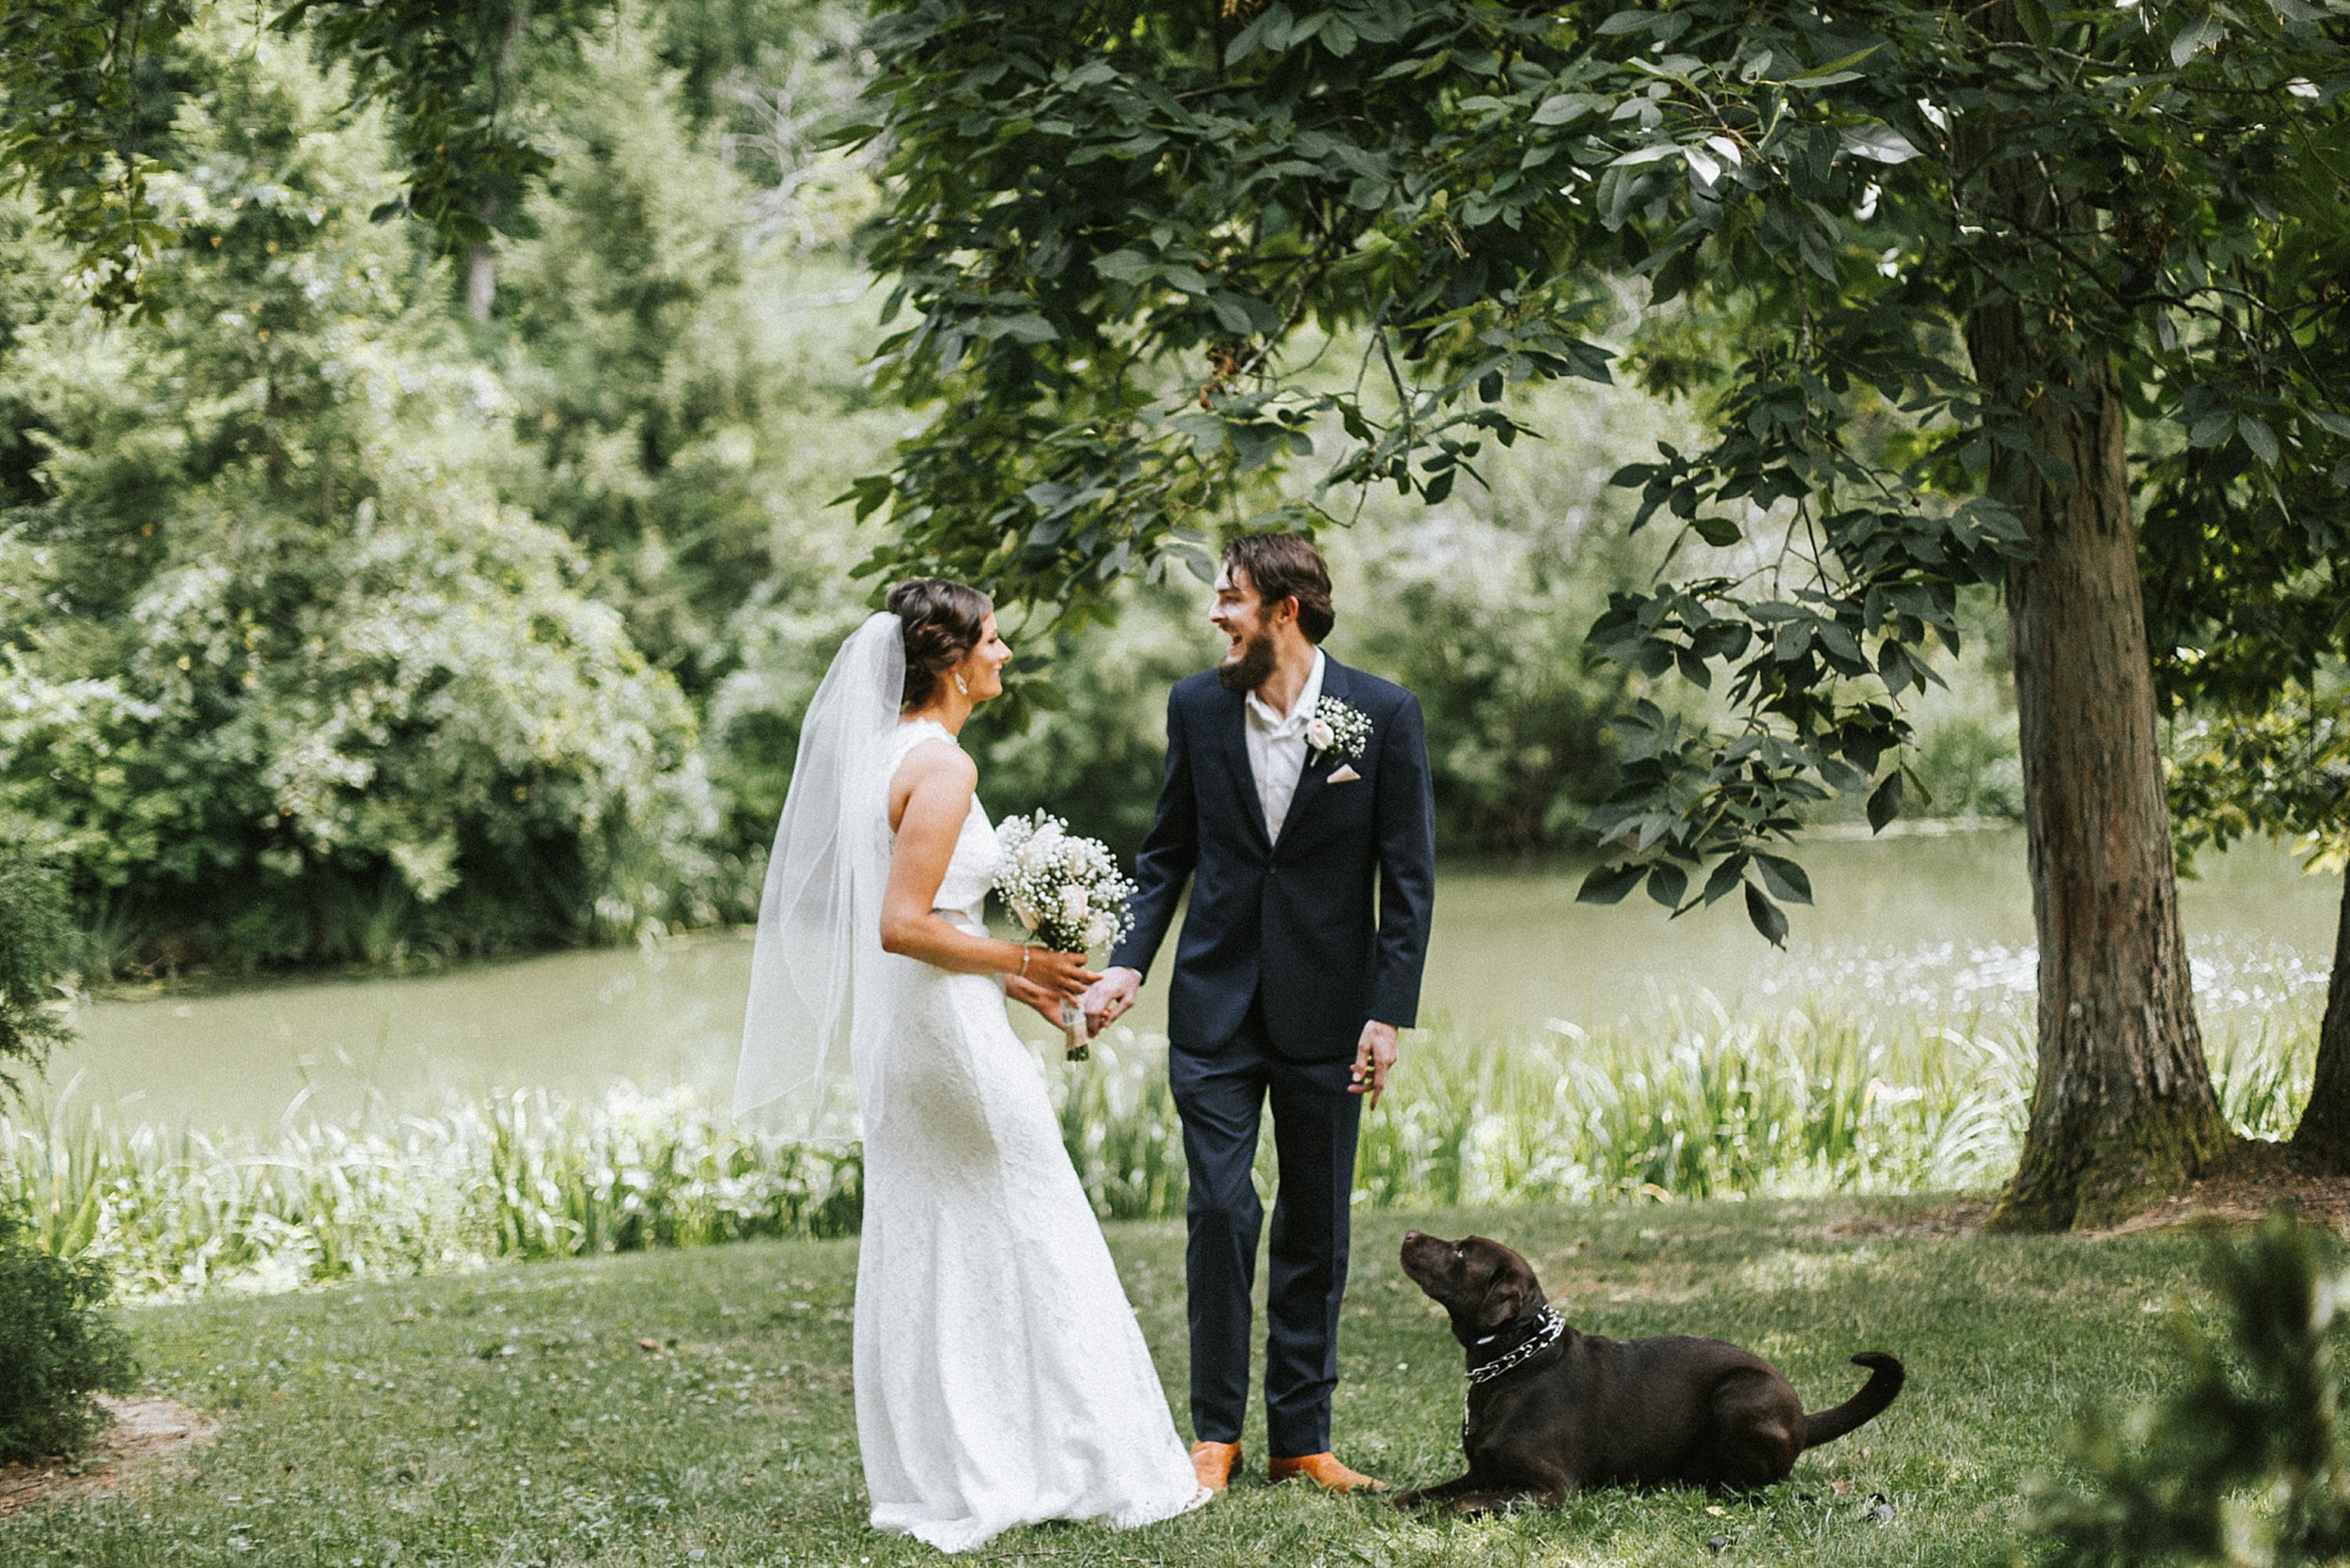 Brooke Townsend Photography - Ohio Wedding Photographer (10 of 78).jpg